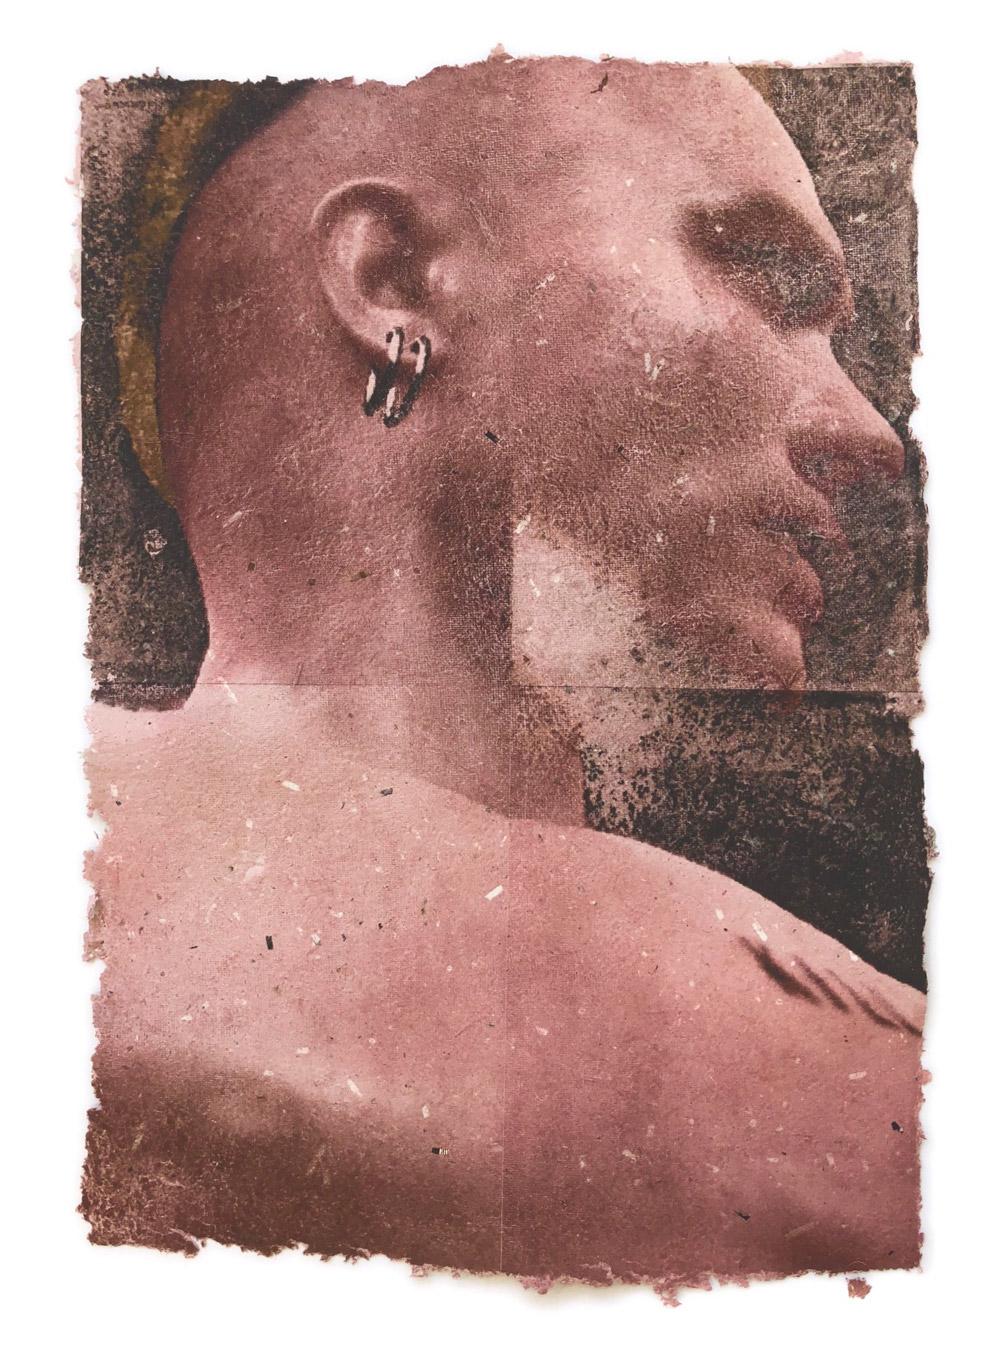 Drew Connor Holland in Vault Magazine - Jan Murphy Gallery